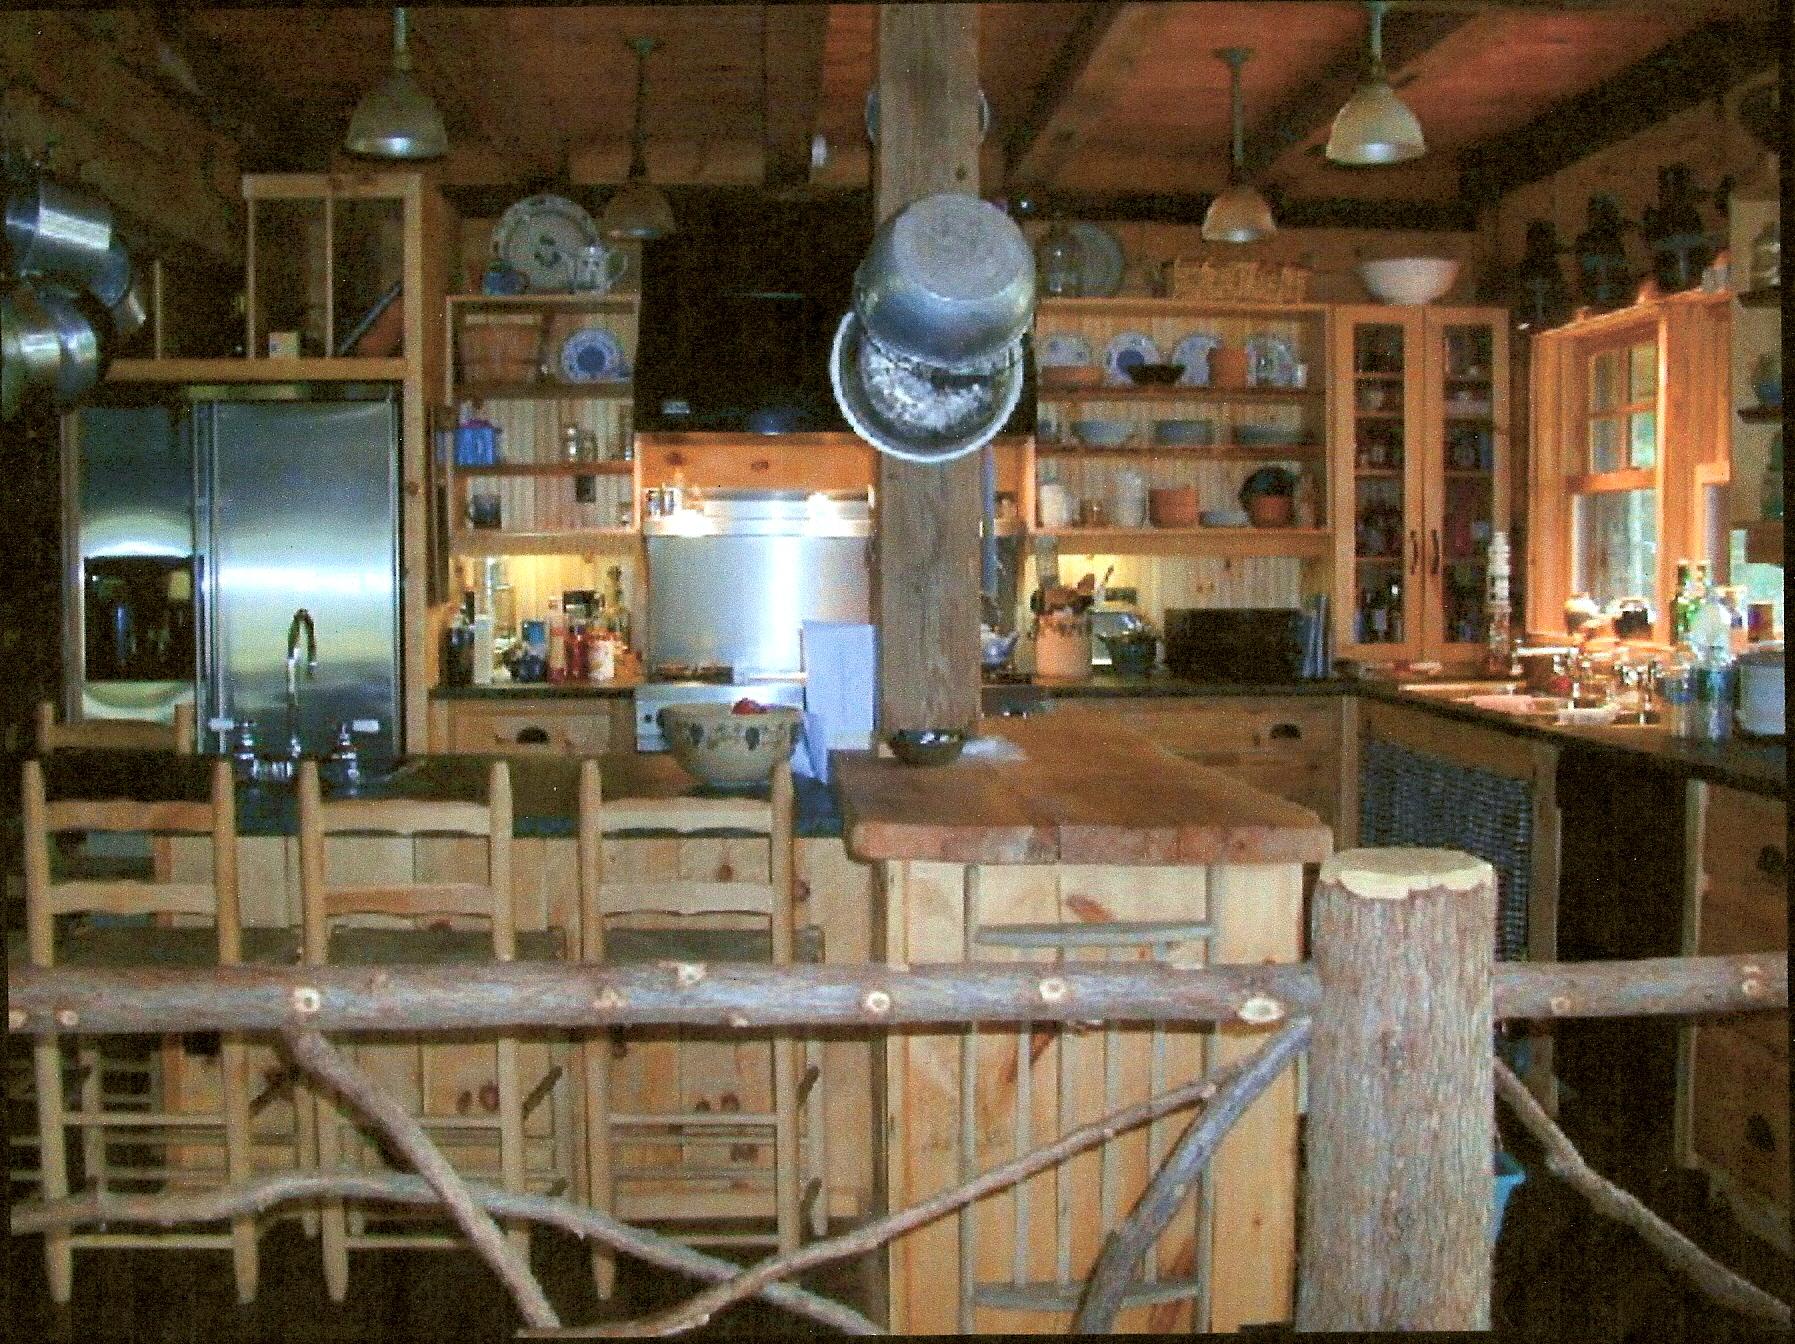 Simple native kitchen design - A Really Fun Design Project